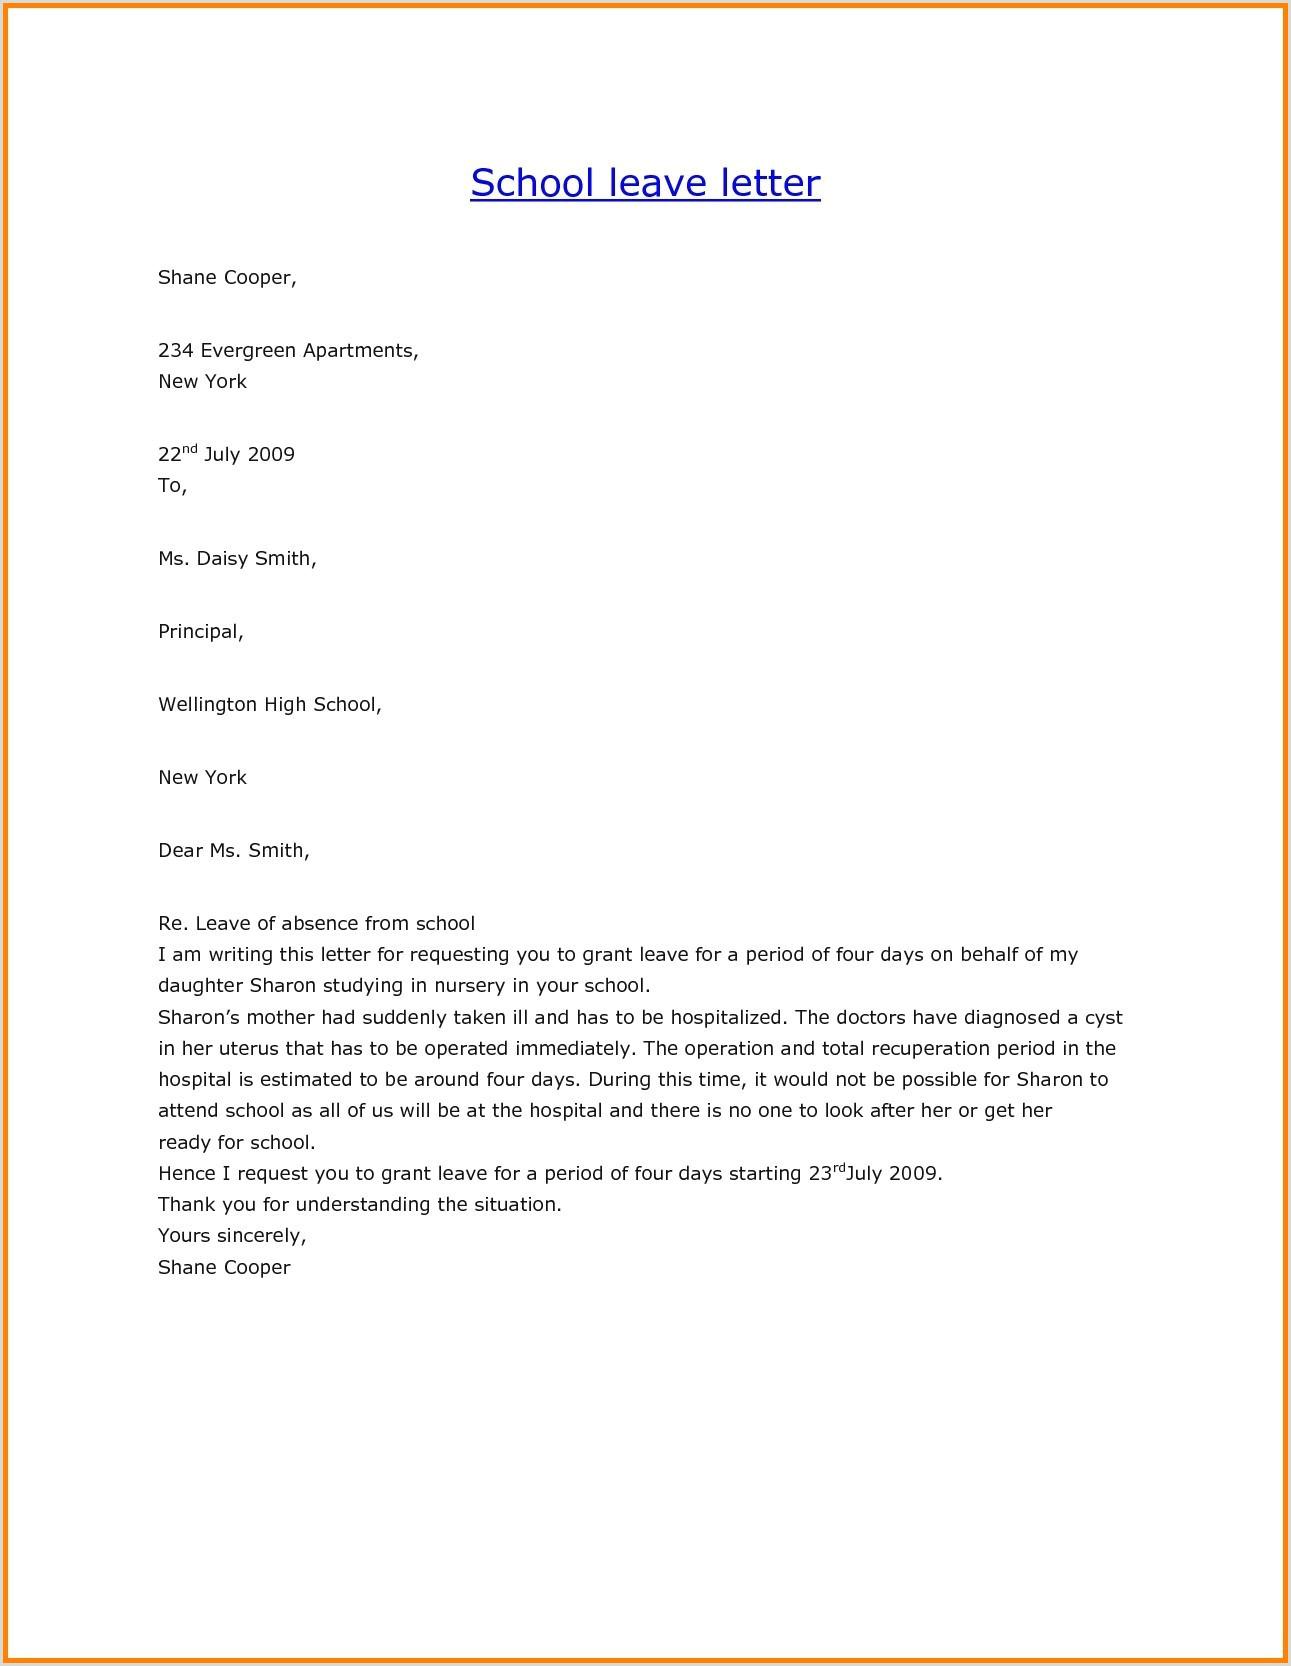 Descargar Plantilla De Curriculum Vitae Basico Para Rellenar Sample Letter Leave Absence